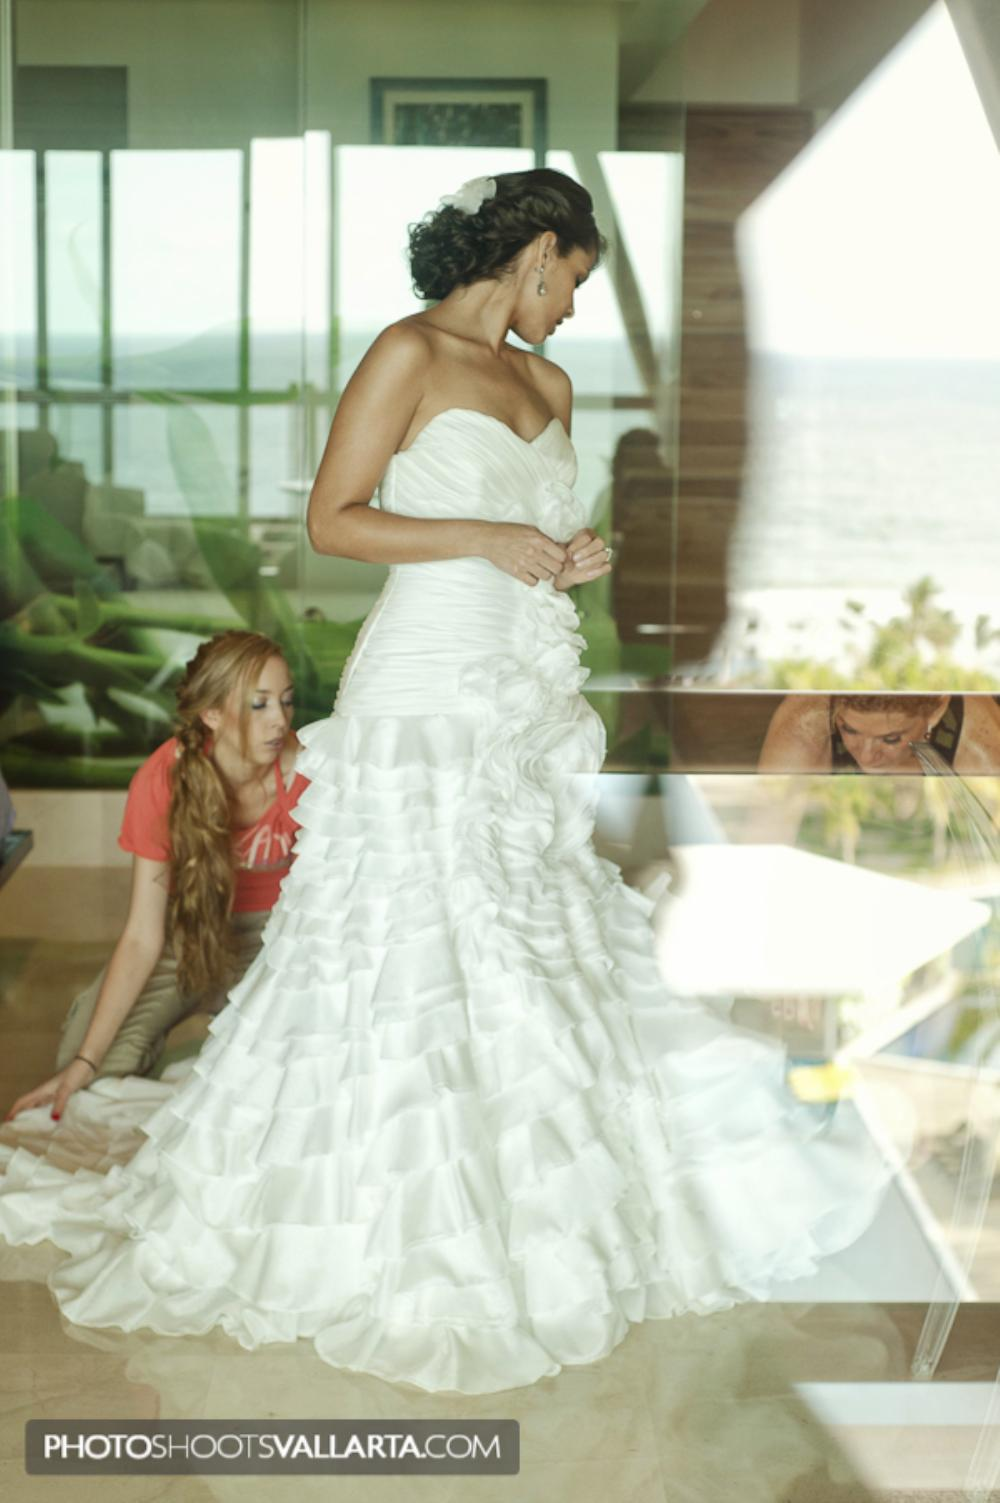 Pamela+Salvador   November 2011 Wedding in La Tranquila, Punta Mita, Mexico   by Eva Sica, http://www.PhotoShootsVallarta.mx